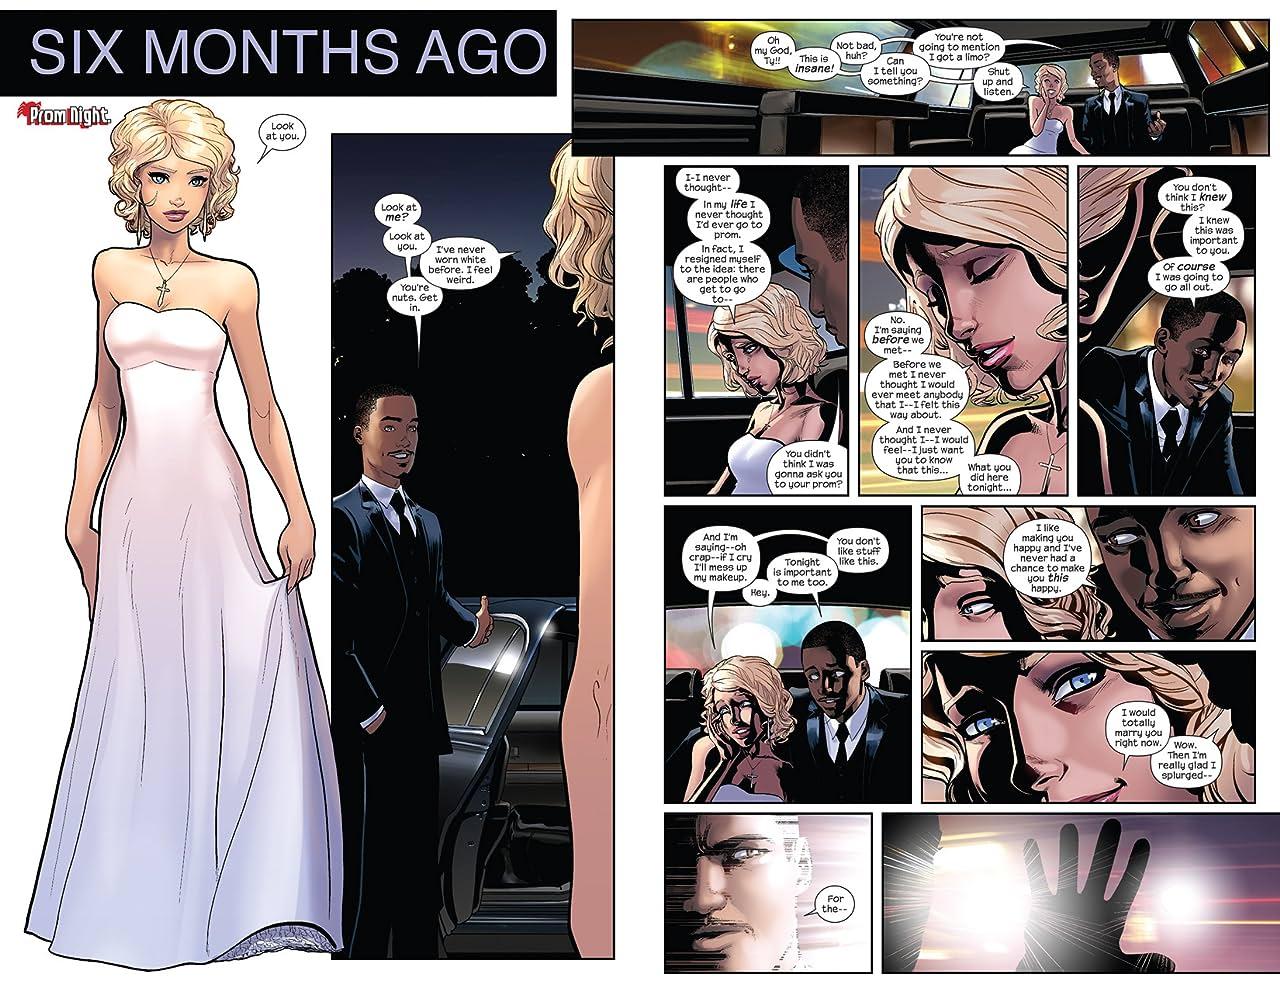 Ultimate Comics Spider-Man (2011-2013) #24